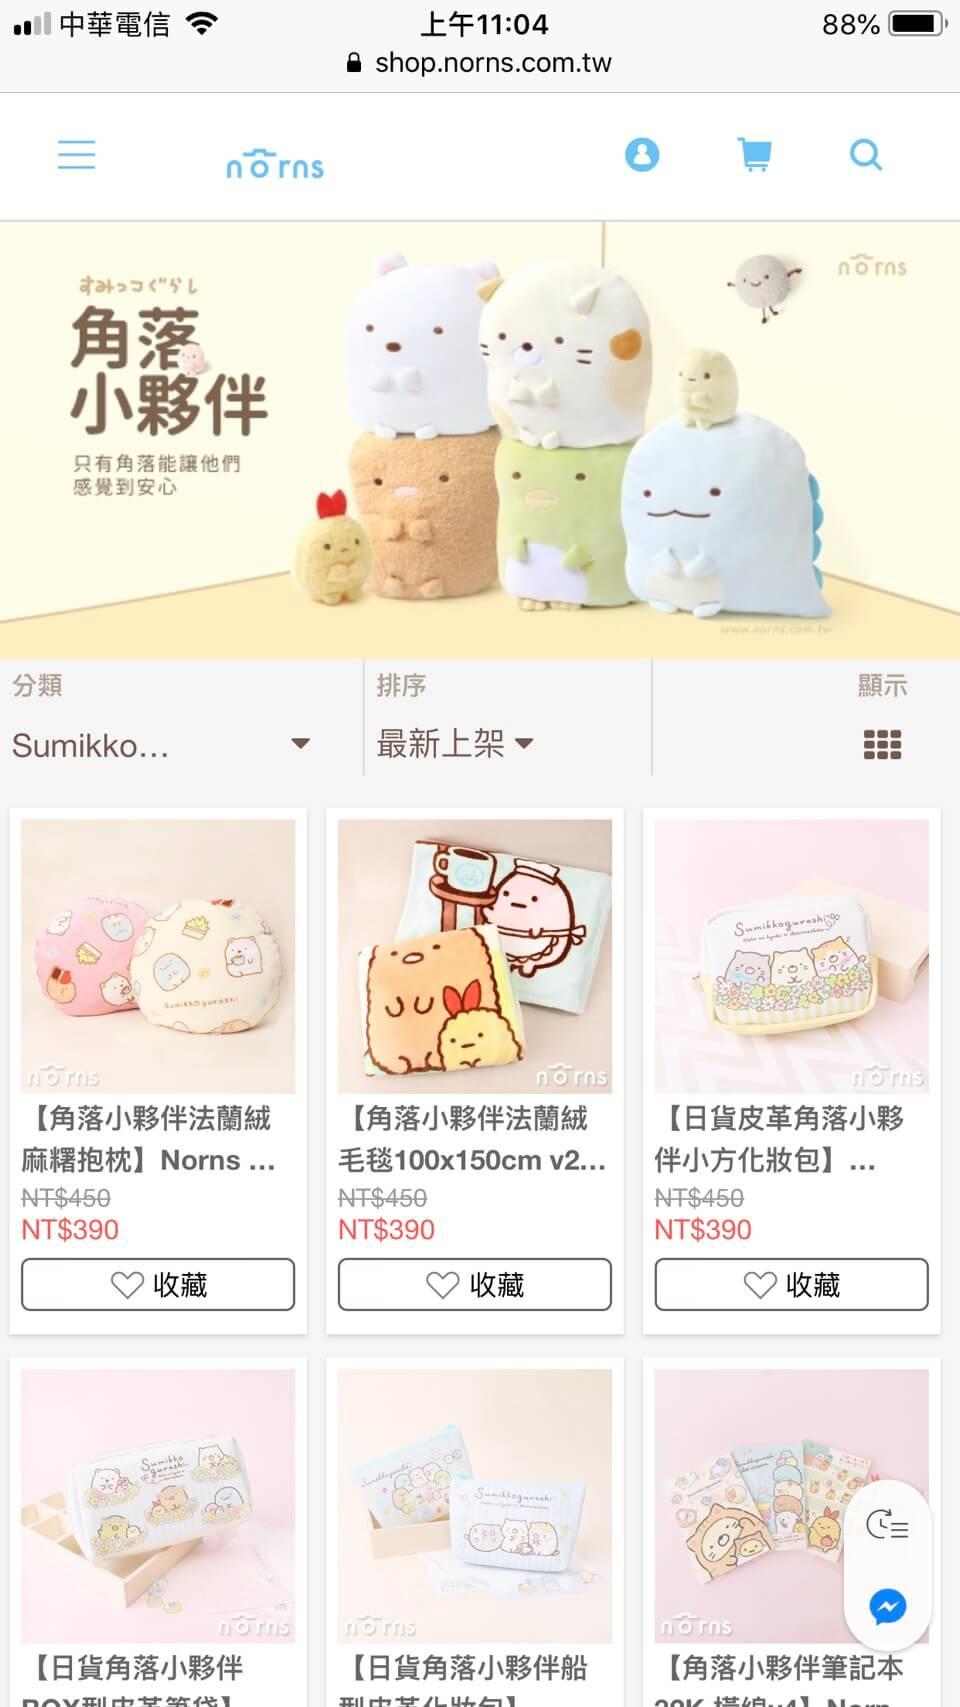 91APP人氣店家 Norns 線上商店 商品分類頁